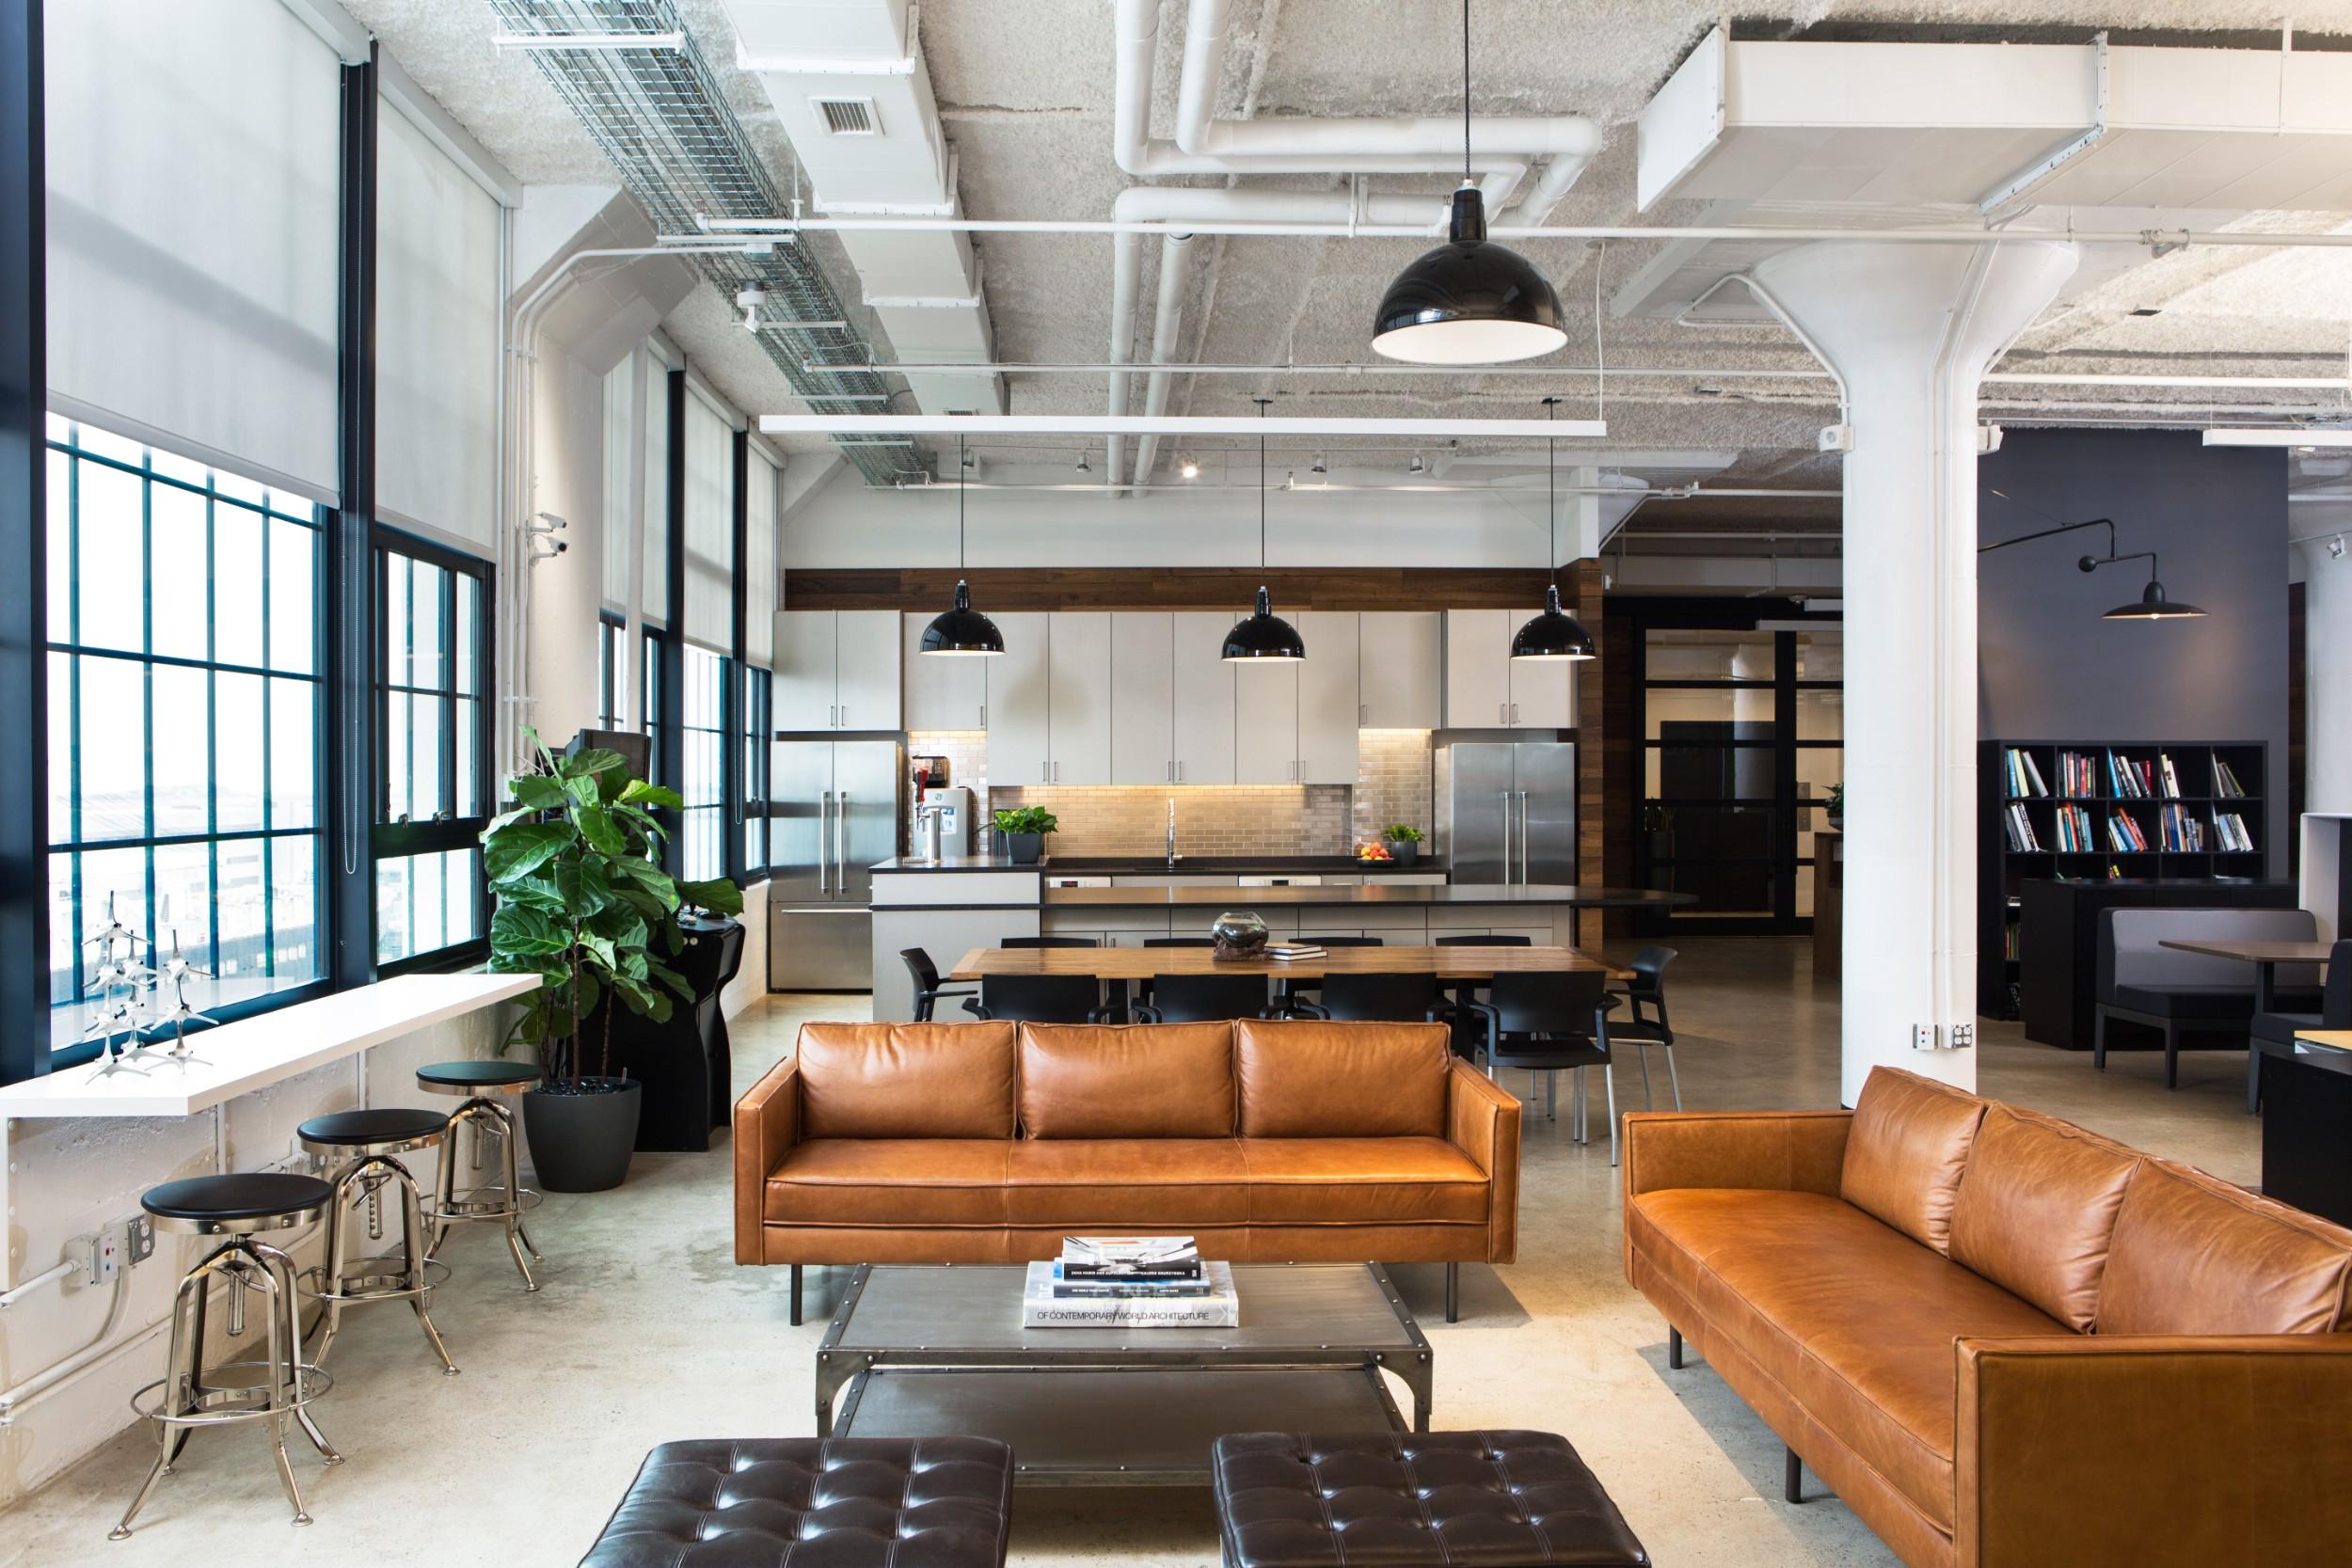 Corderman_Company_Construction_Neoscape_Office_Design_Seaport_Boston_Expansive_Cafe_View.jpg